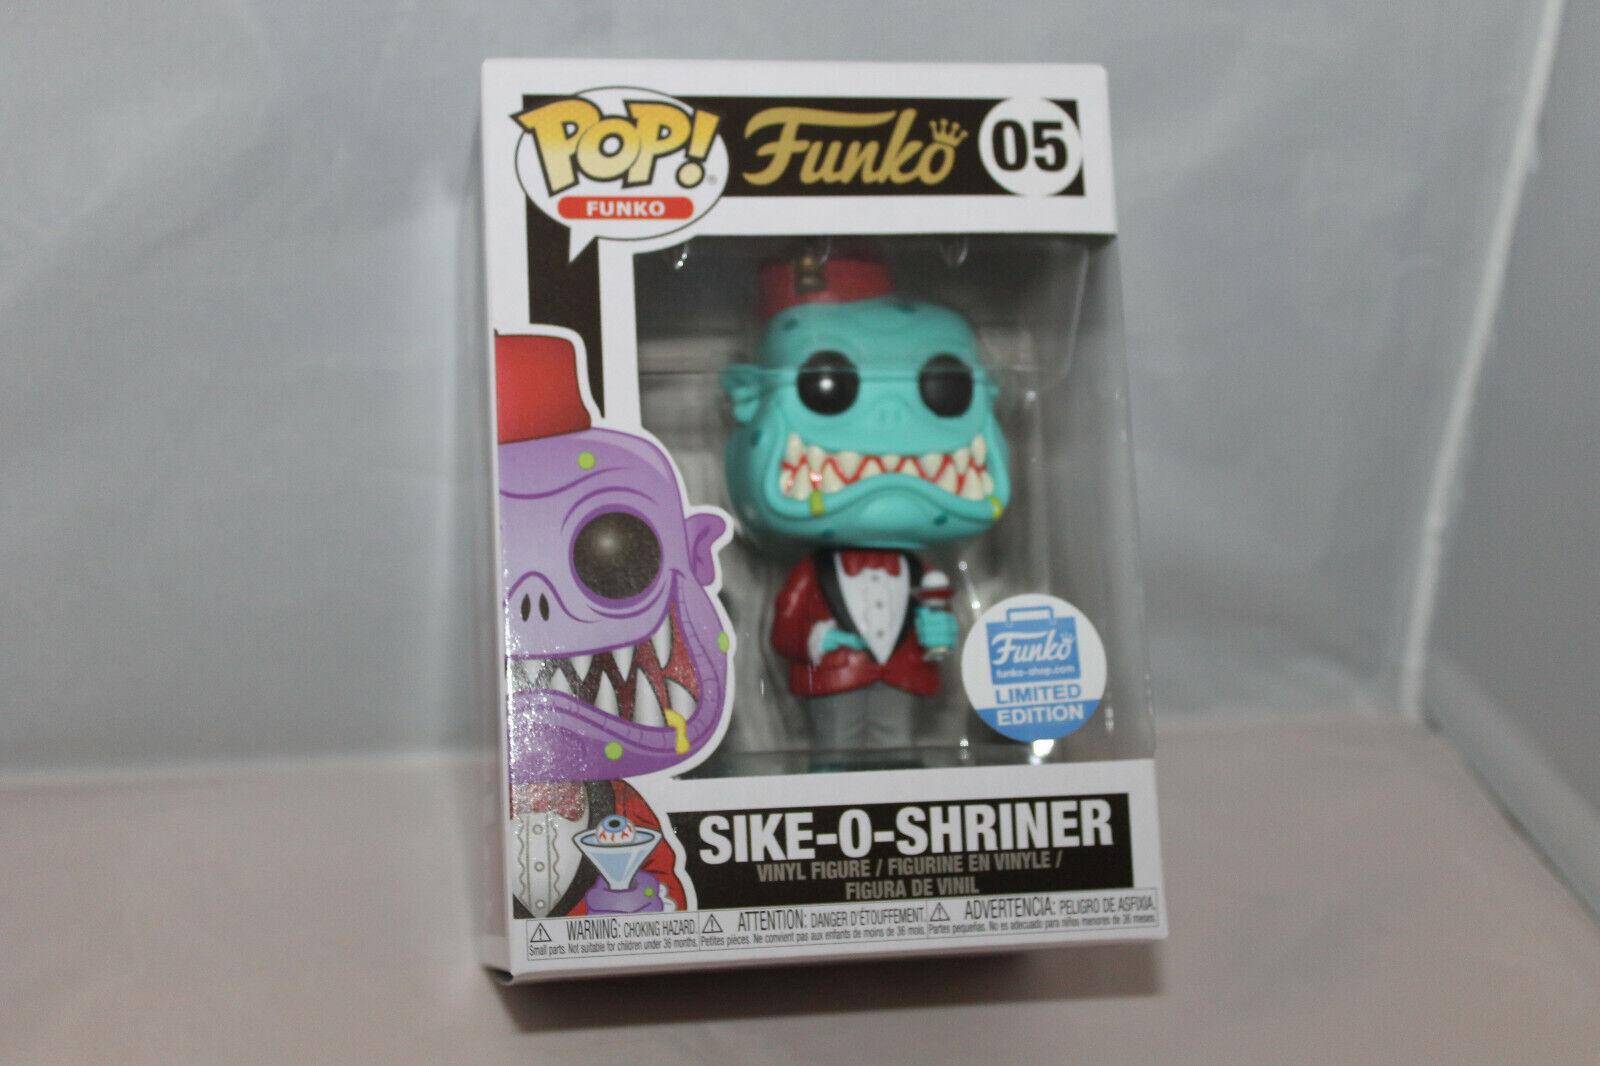 Funko Pop  Vinyl Figure - Funko Sike-O-Shriner [Teal] - Funko Shop Excl